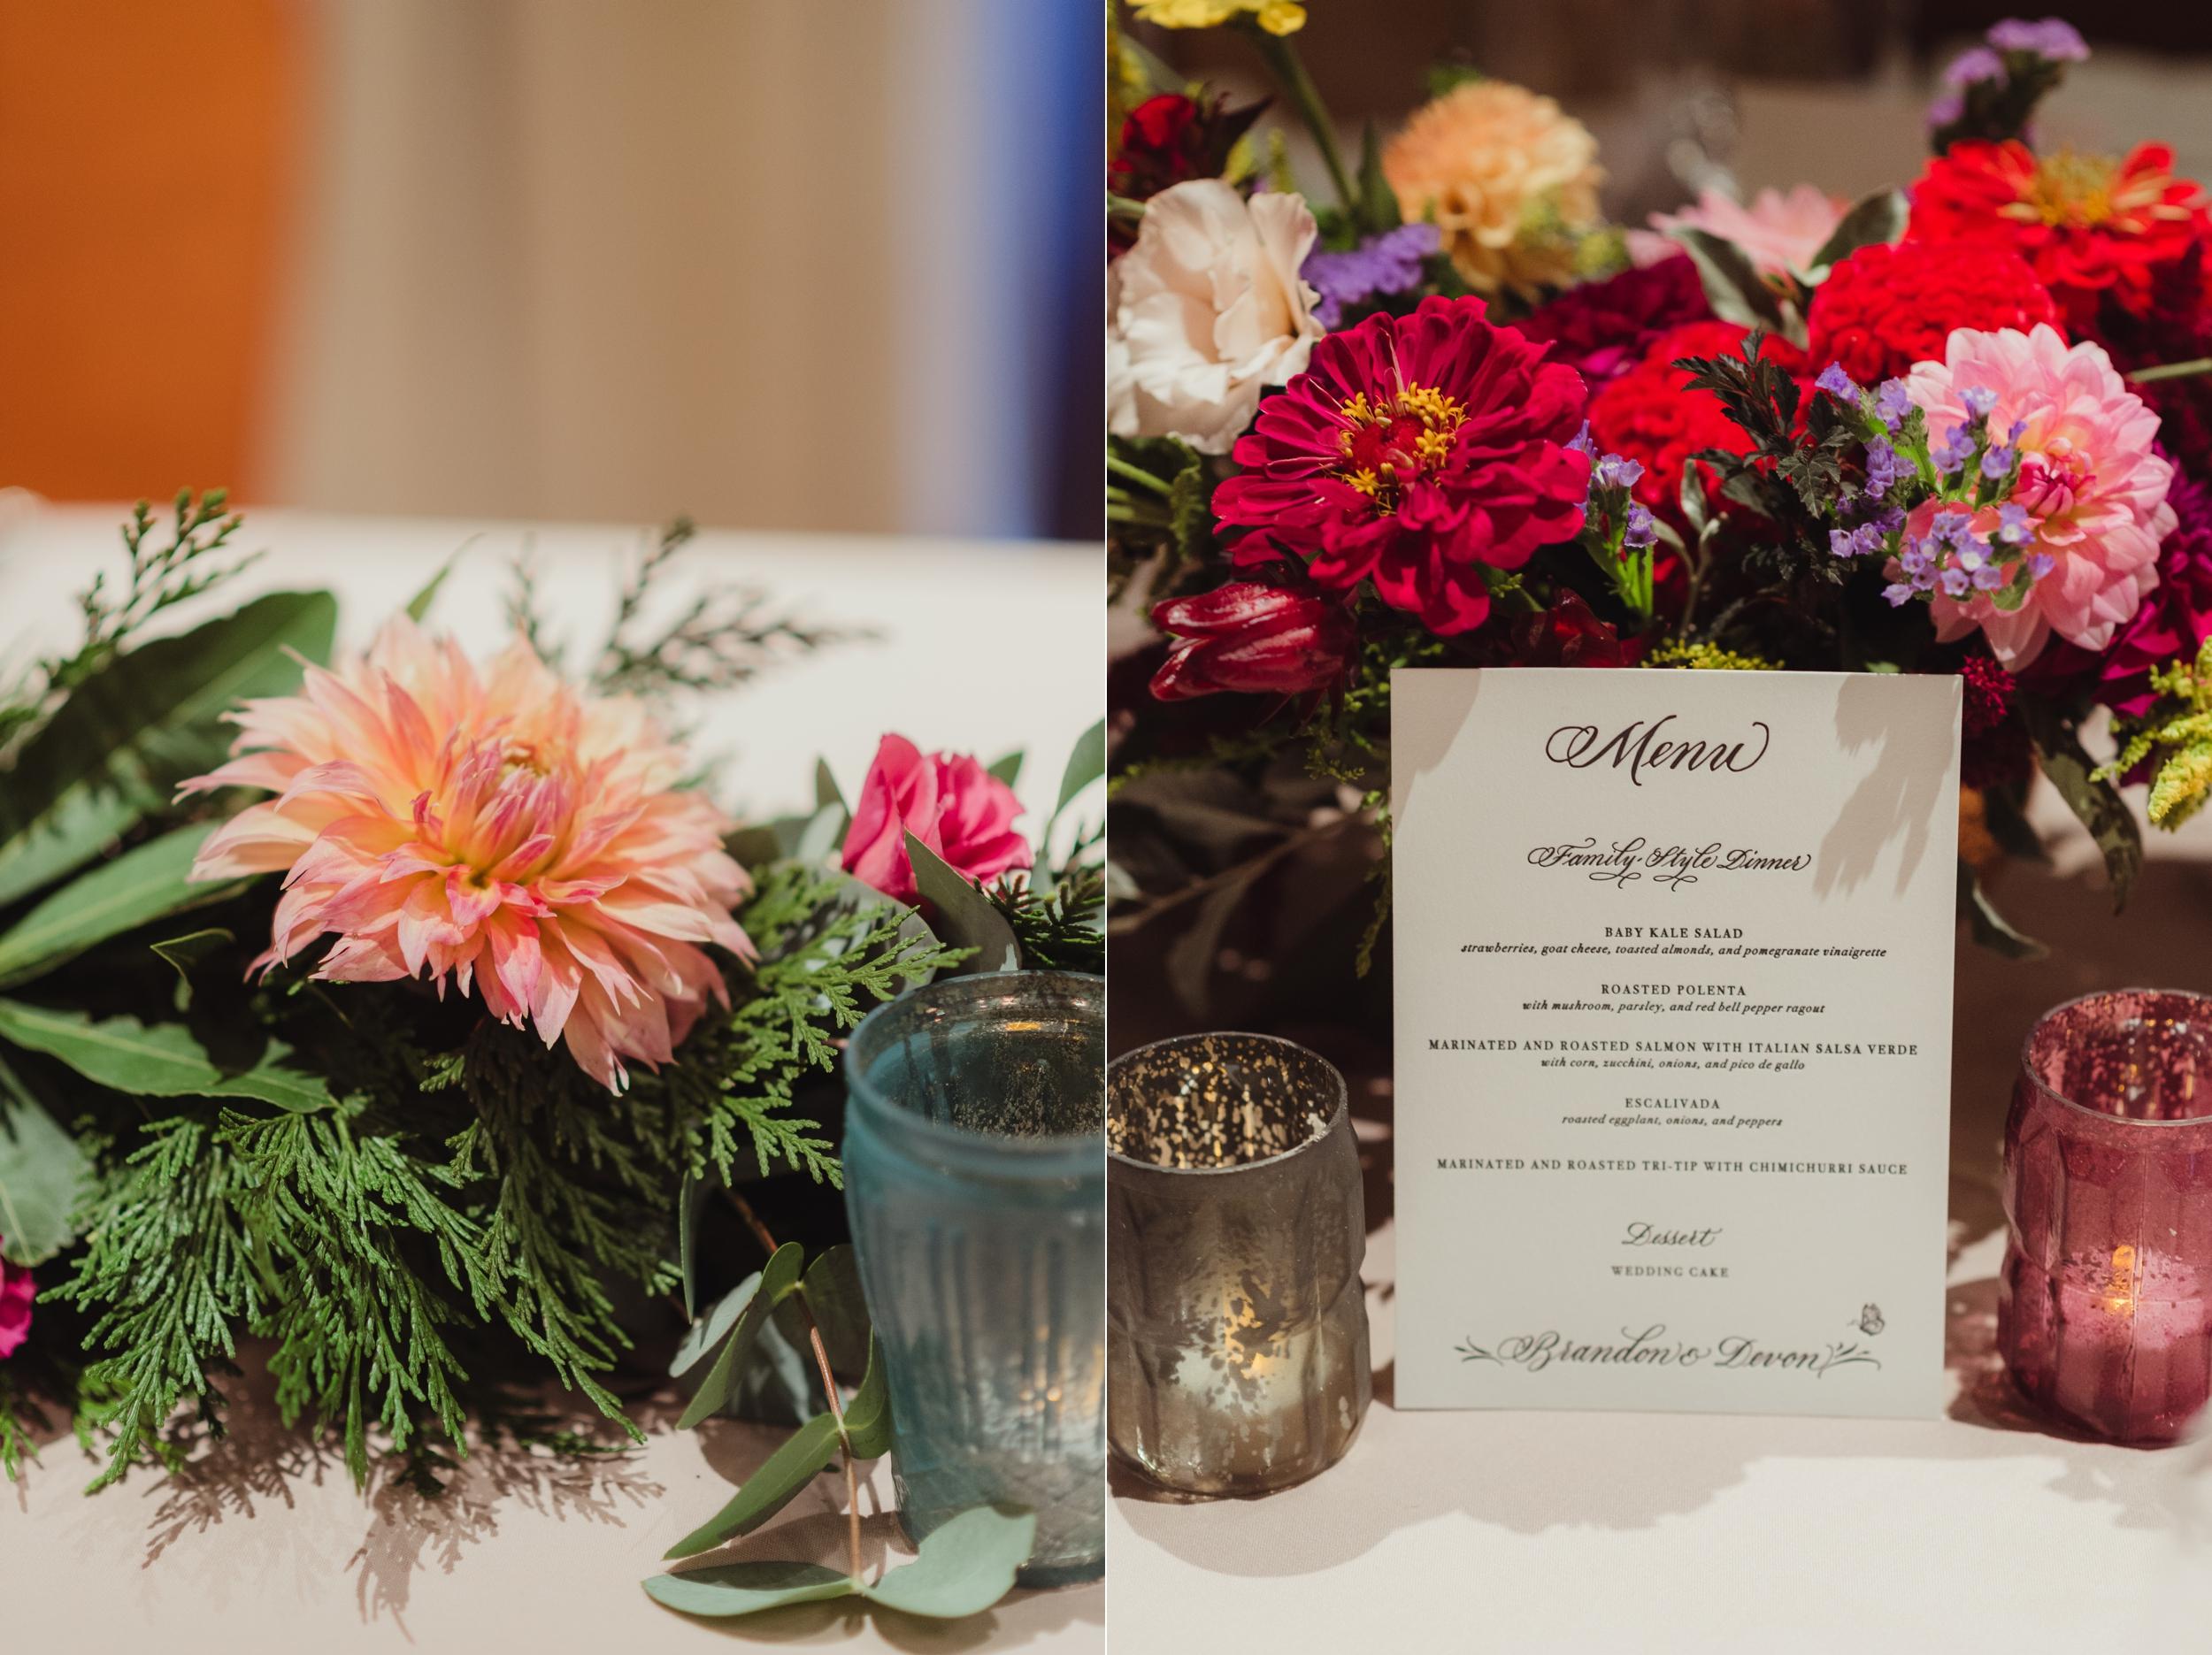 64-outdoor-art-club-wedding-vivianchen-070_WEB.jpg